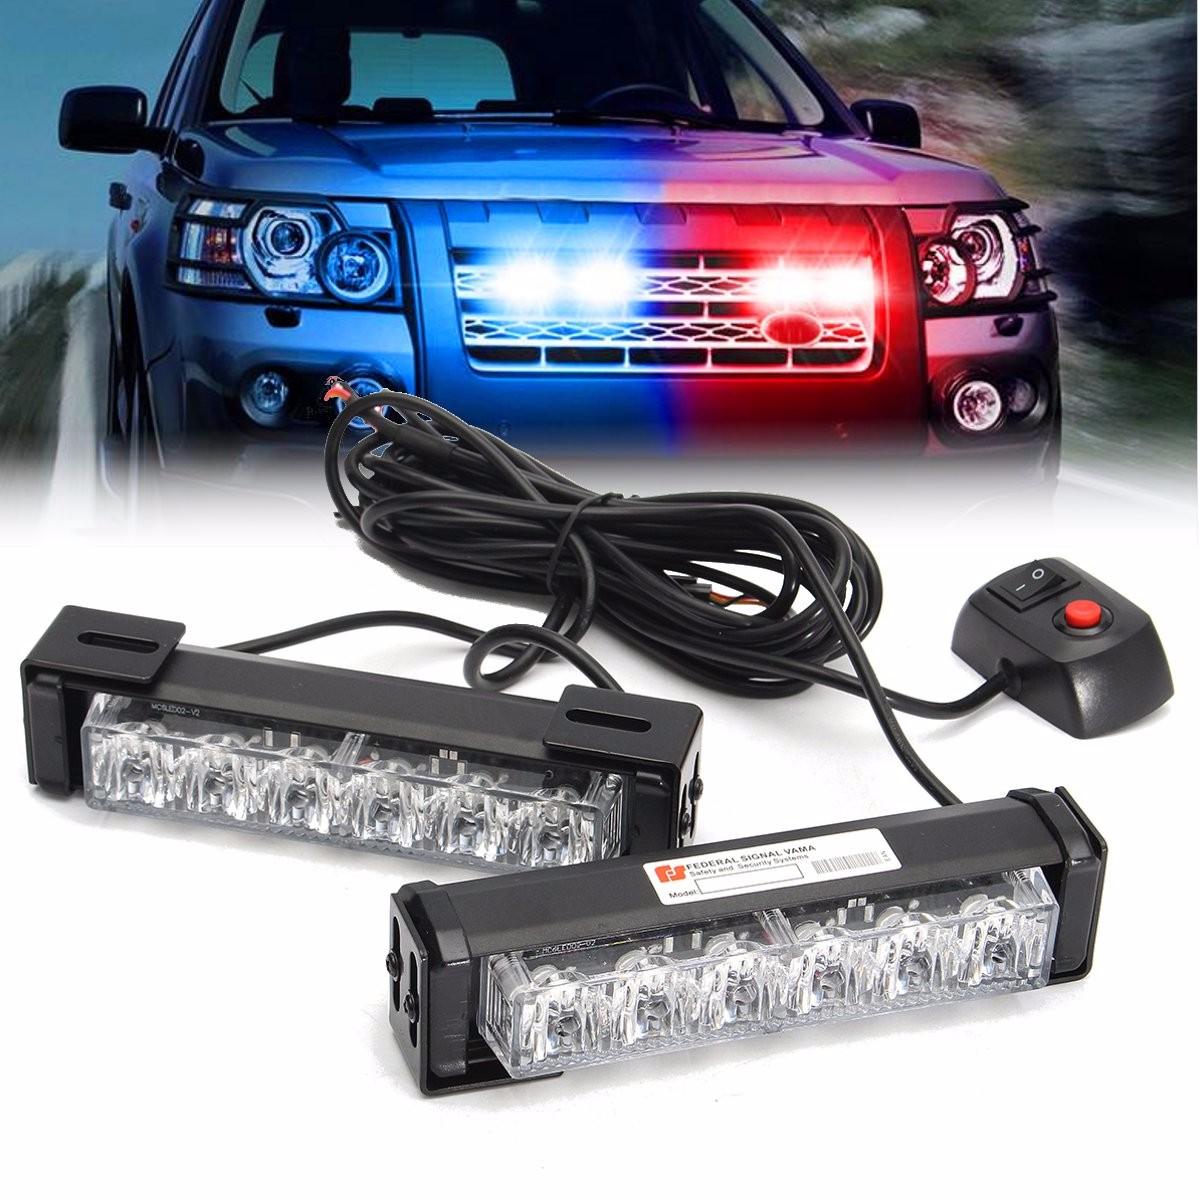 2 in 1 LED Strobe Lights Front Grille Flashlight Warning Lamp 12V 6W for SUV Truck Off Road Car